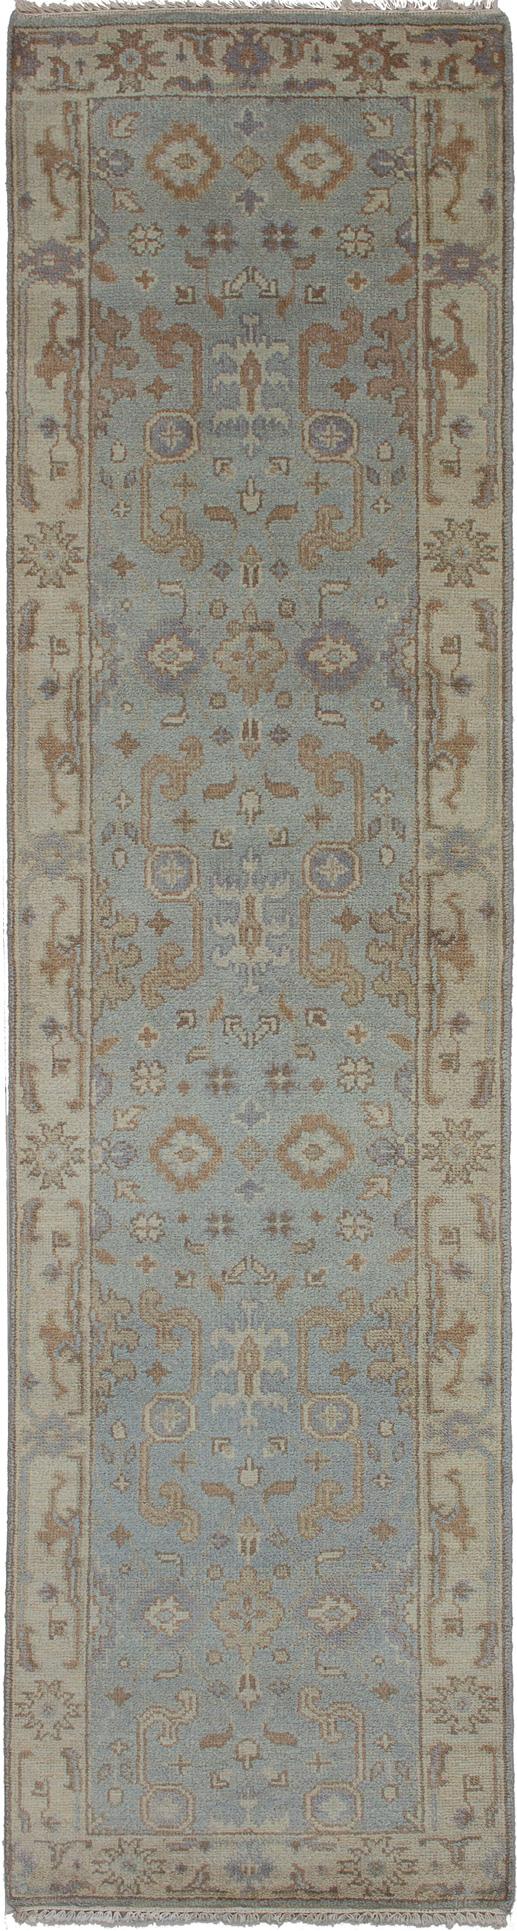 "Hand-knotted Royal Ushak Light Blue  Wool Rug 2'7"" x 9'9""  Size: 2'7"" x 9'9"""